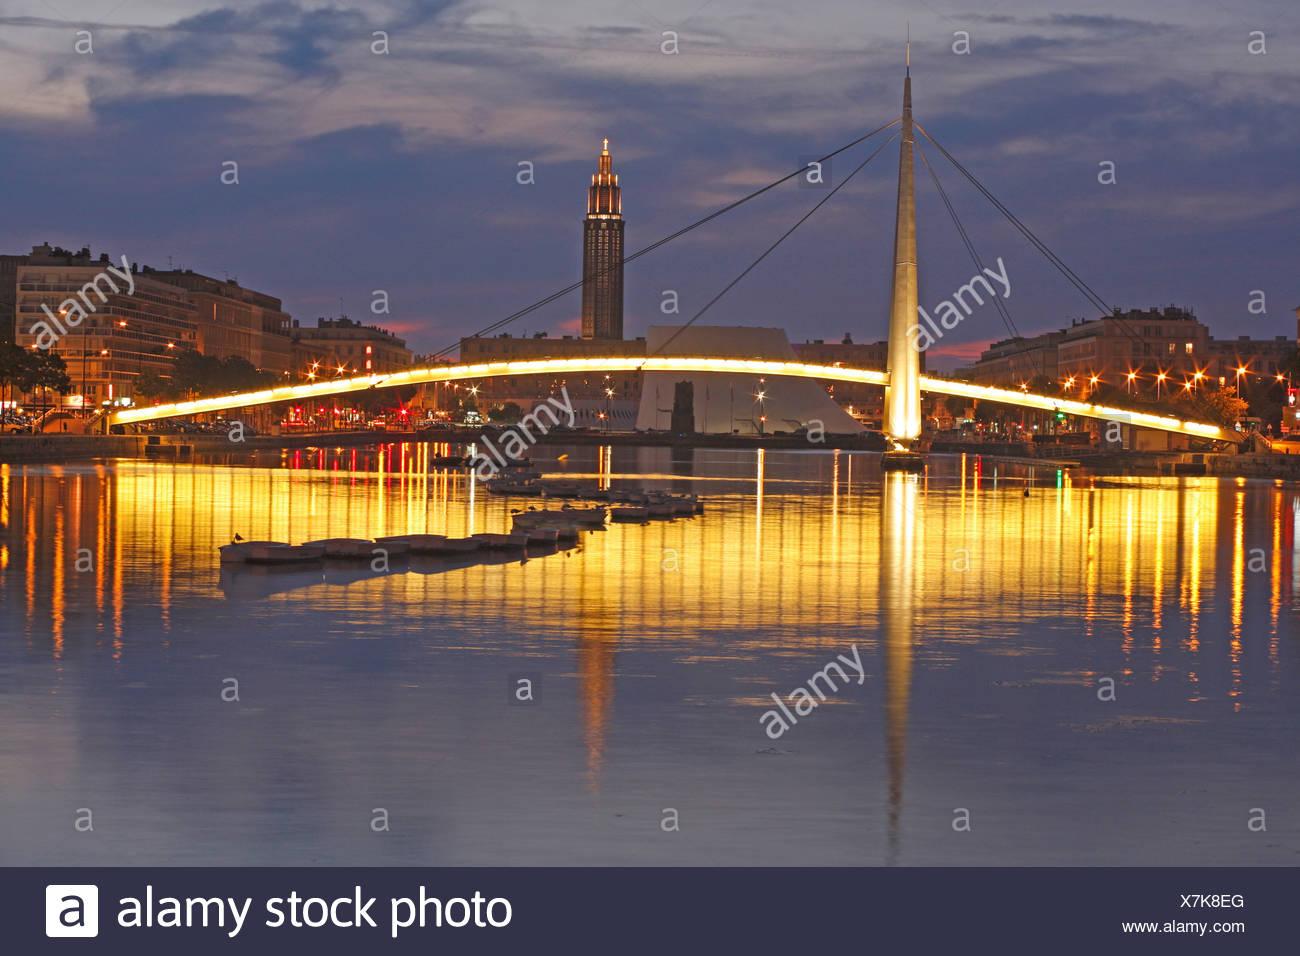 Bassin du Commerce, Le Havre, Normandy, France, Europe, night, canal, bridge - Stock Image